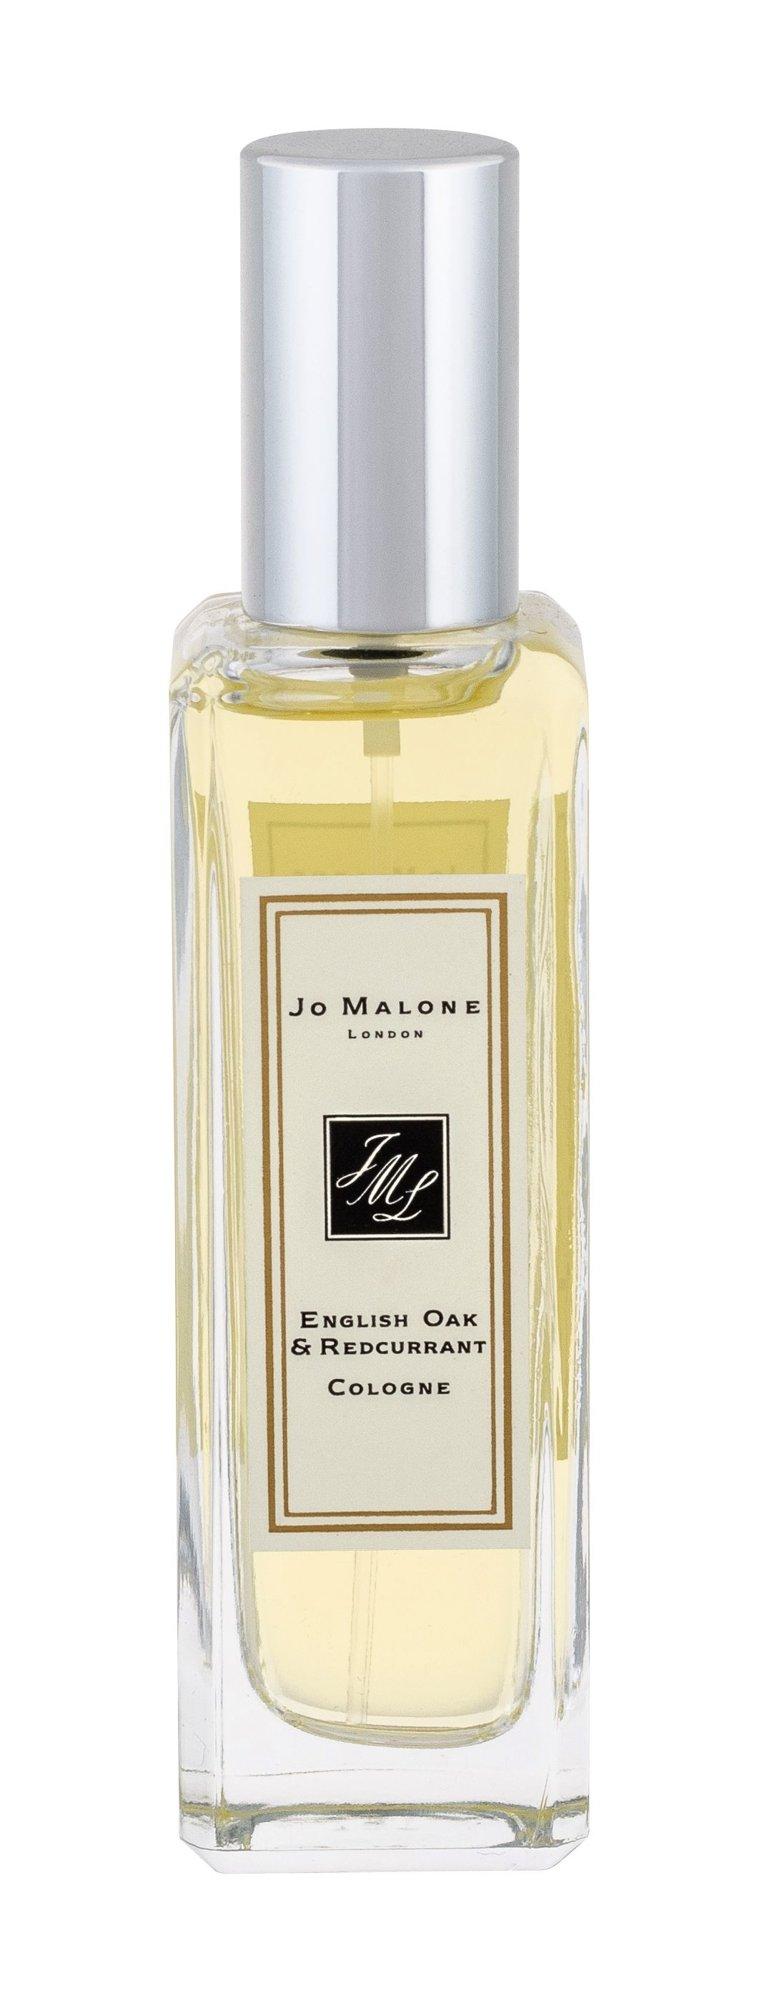 Jo Malone English Oak & Redcurrant Eau de Cologne 30ml